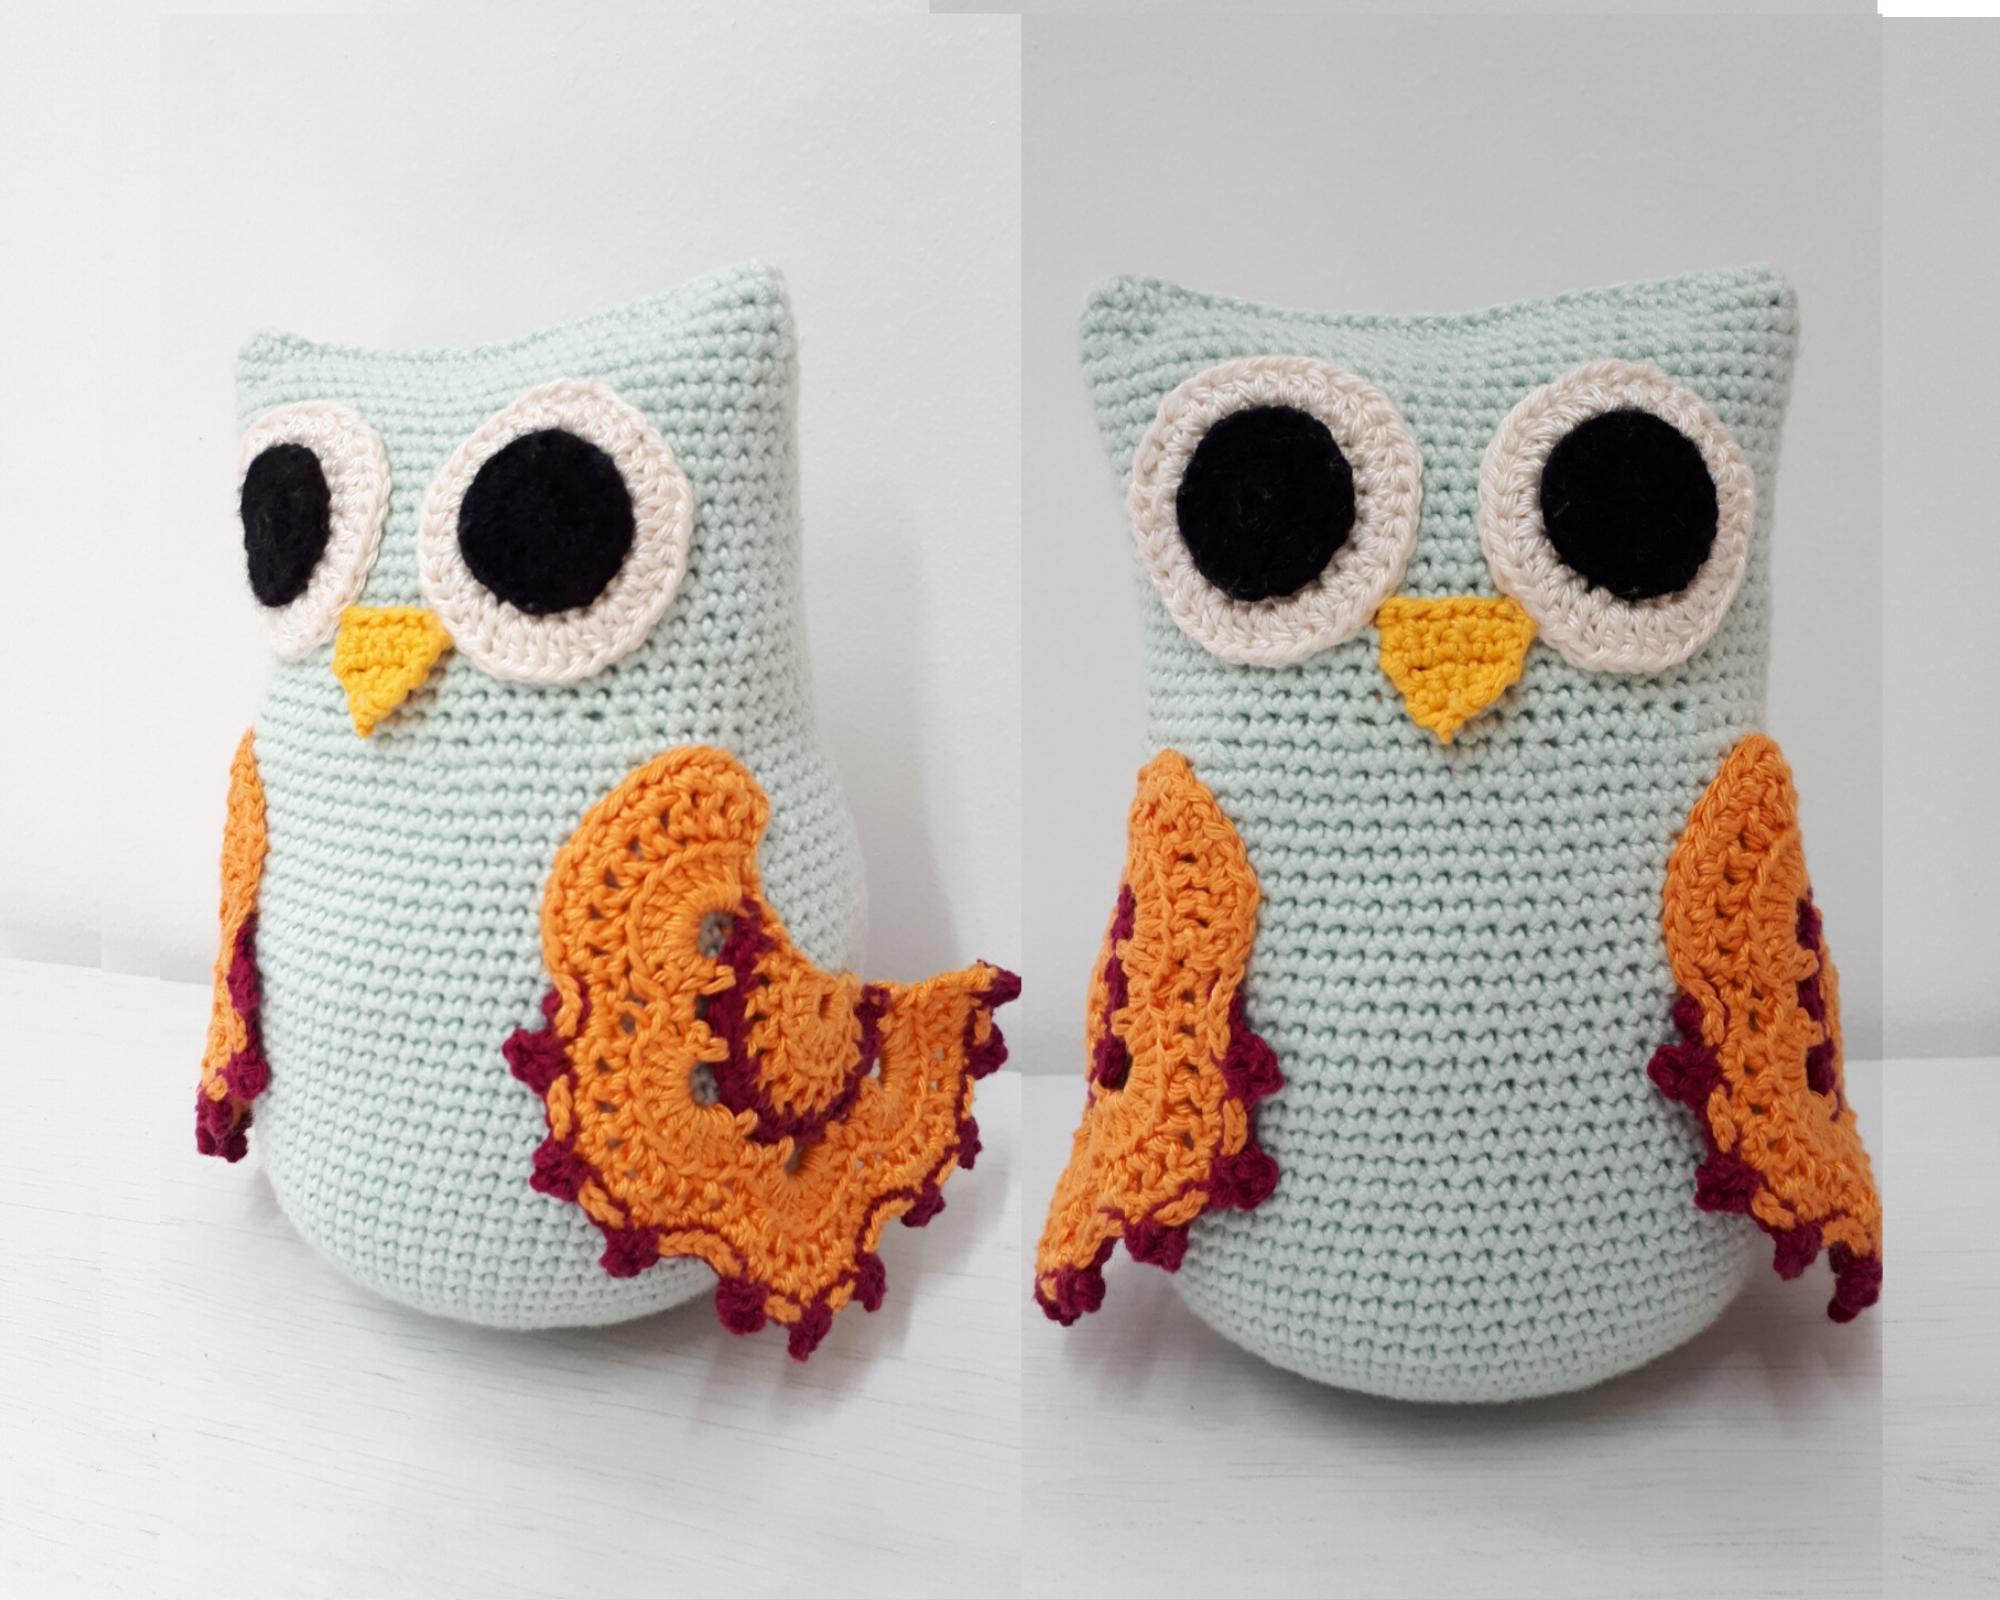 Knit Pillow Pattern Amigurumi Owl Knitted animal kids decor | Etsy | 1600x2000